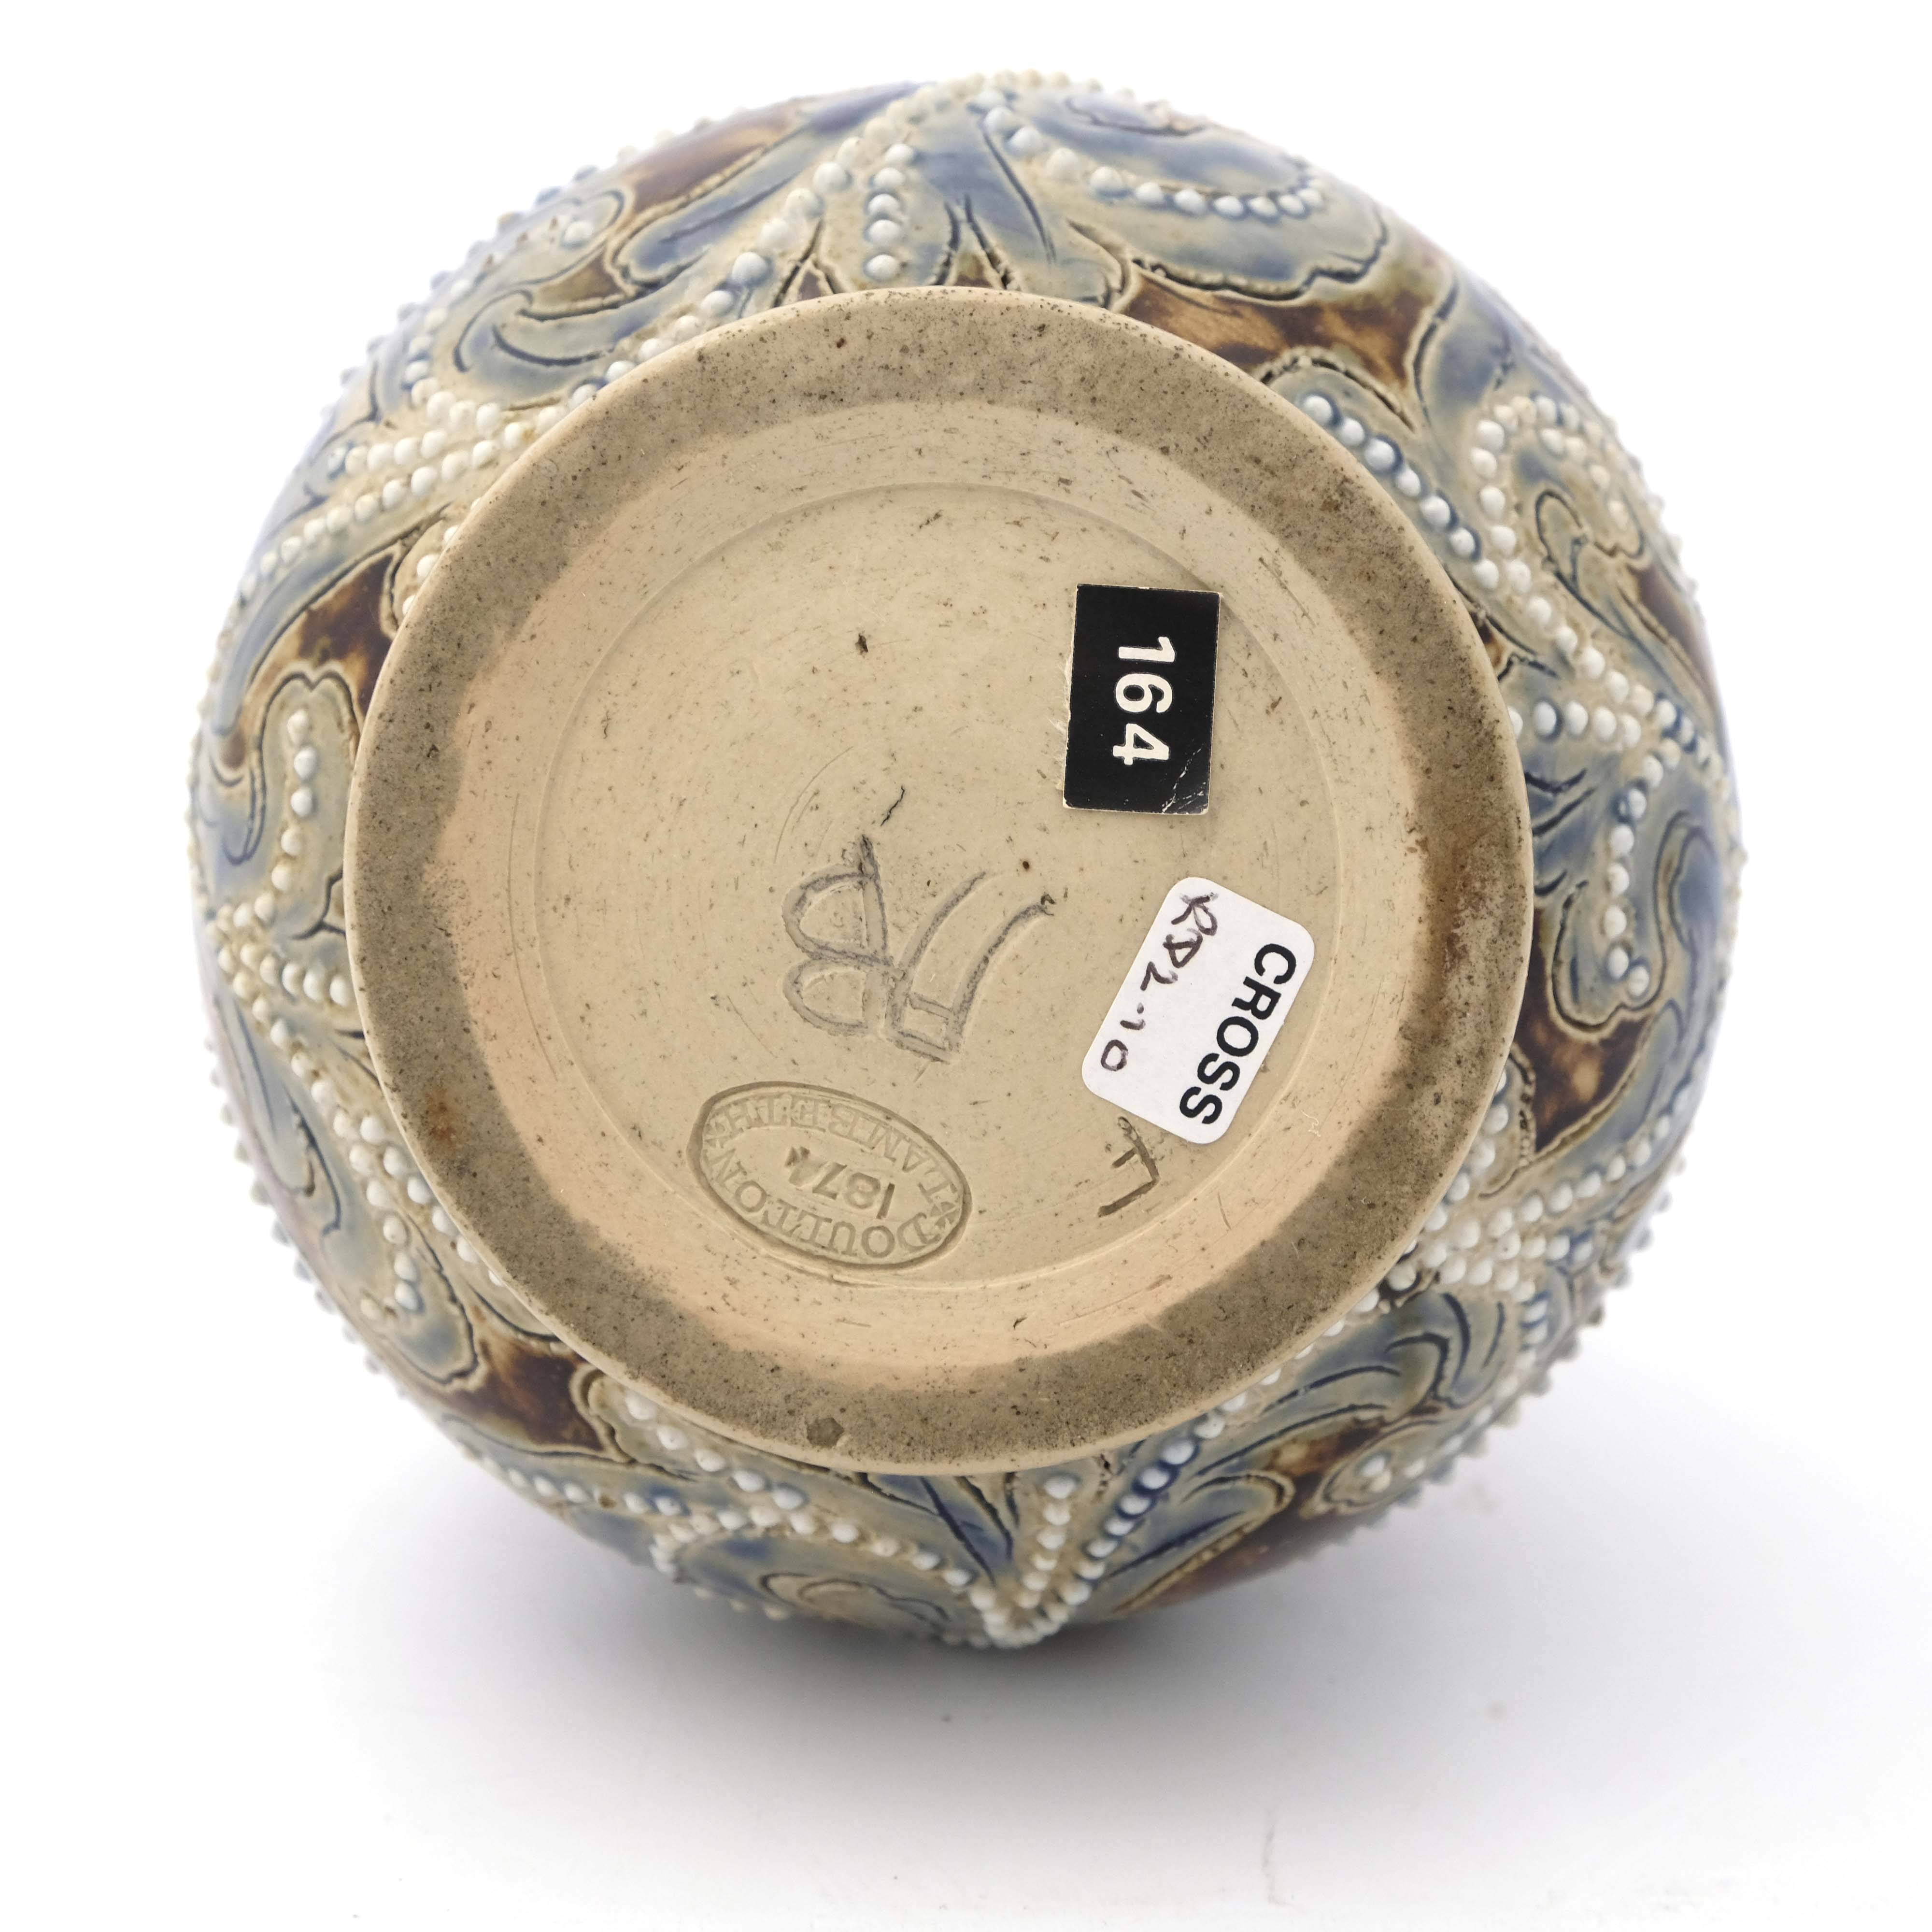 Frank Butler for Doulton Lambeth, a stoneware jug - Image 6 of 6